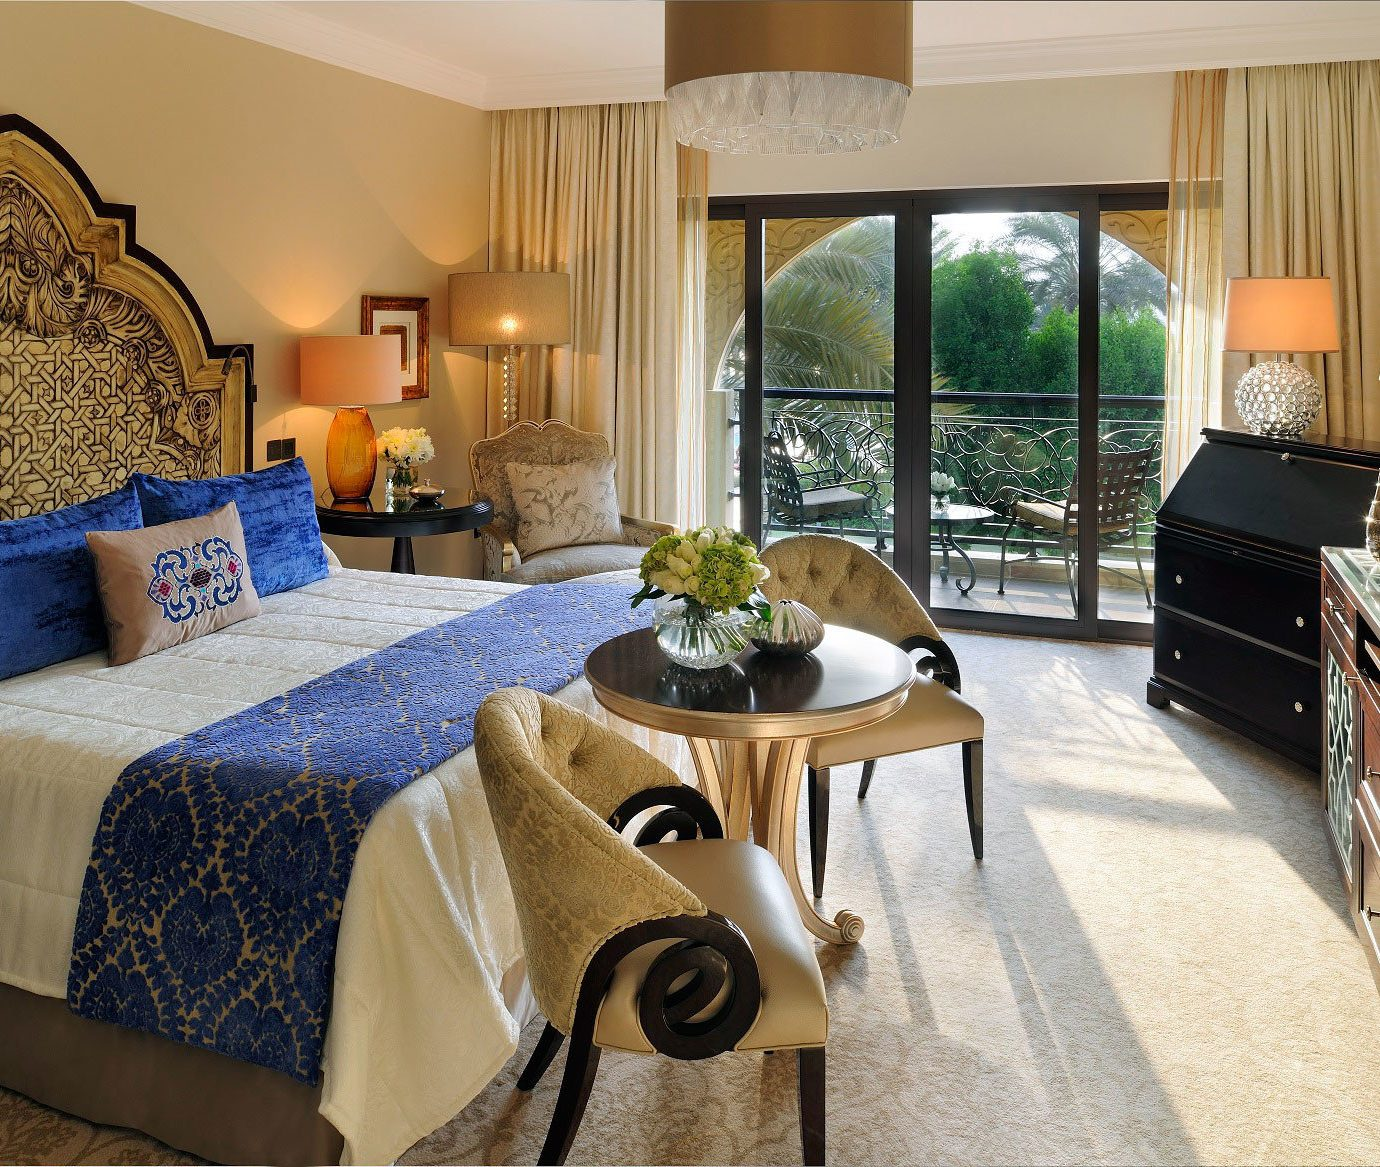 Bedroom Dubai Elegant Hotels Luxury Luxury Travel Middle East Modern Resort Scenic views property home Suite living room cottage Villa